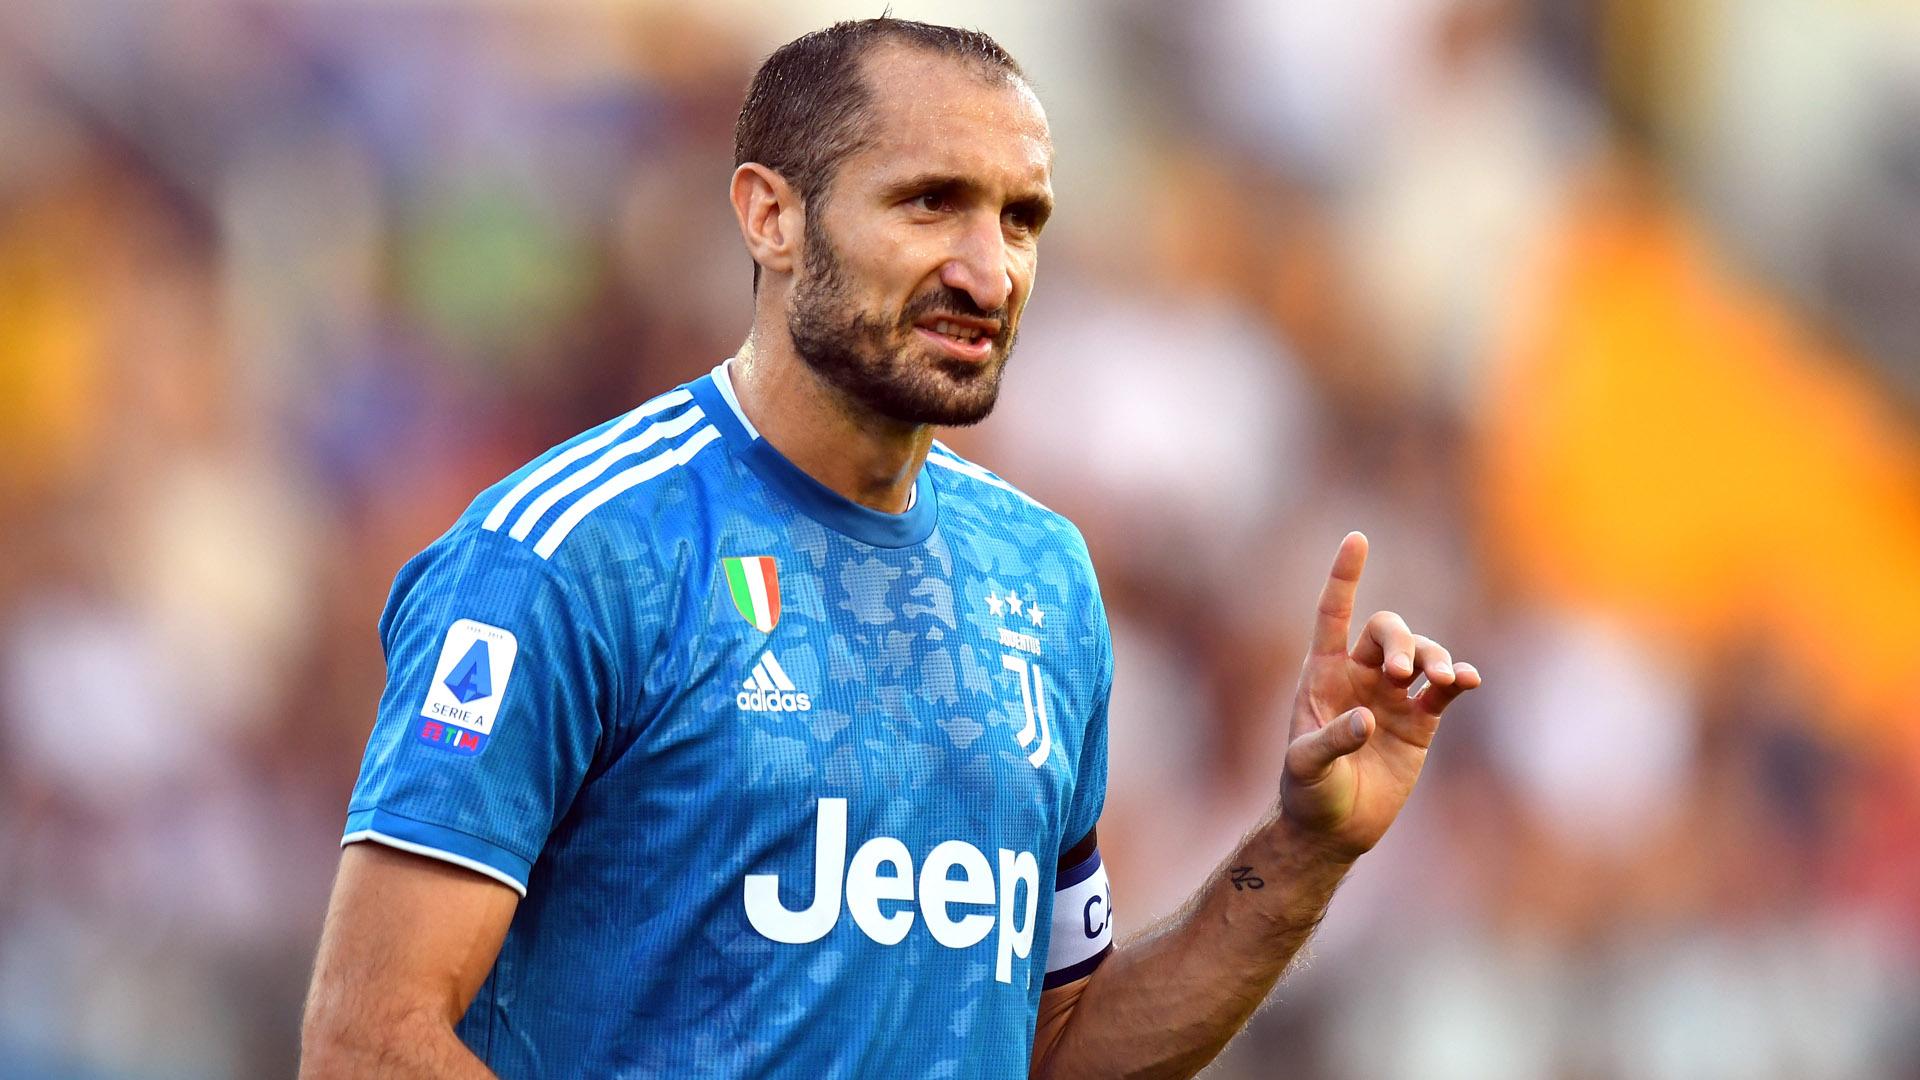 Juventus, lista seconda parte Champions: dentro Chiellini e Khedira